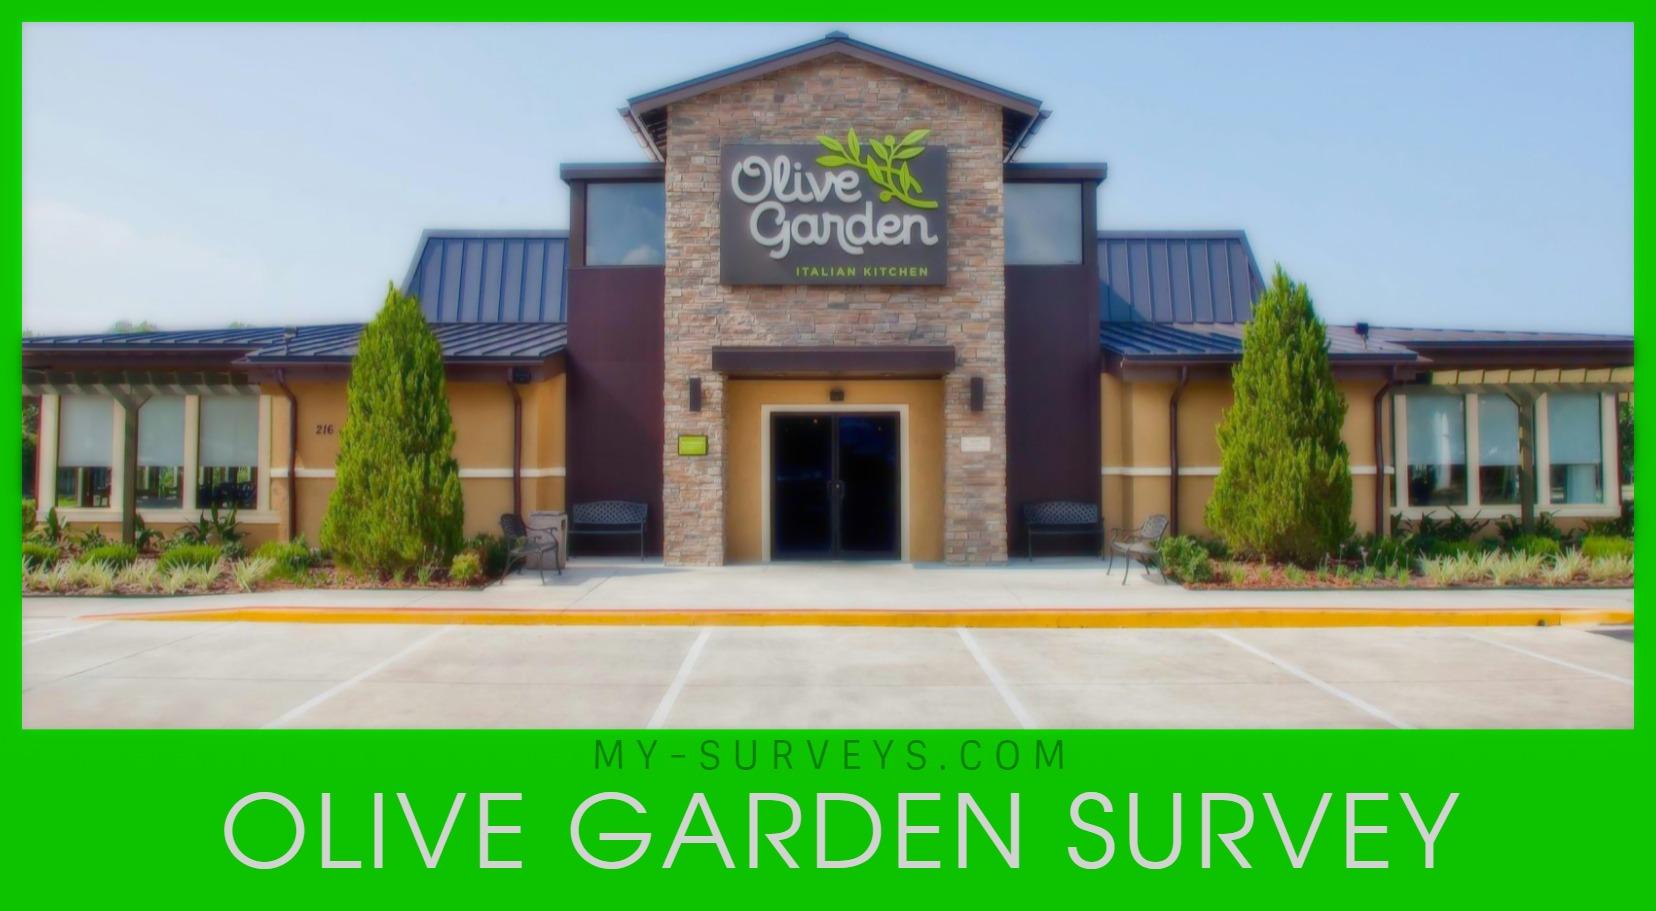 OLIVE GARDEN SURVEY- Take Entry In Sweepstakes @ www.olivegardensurvey.com